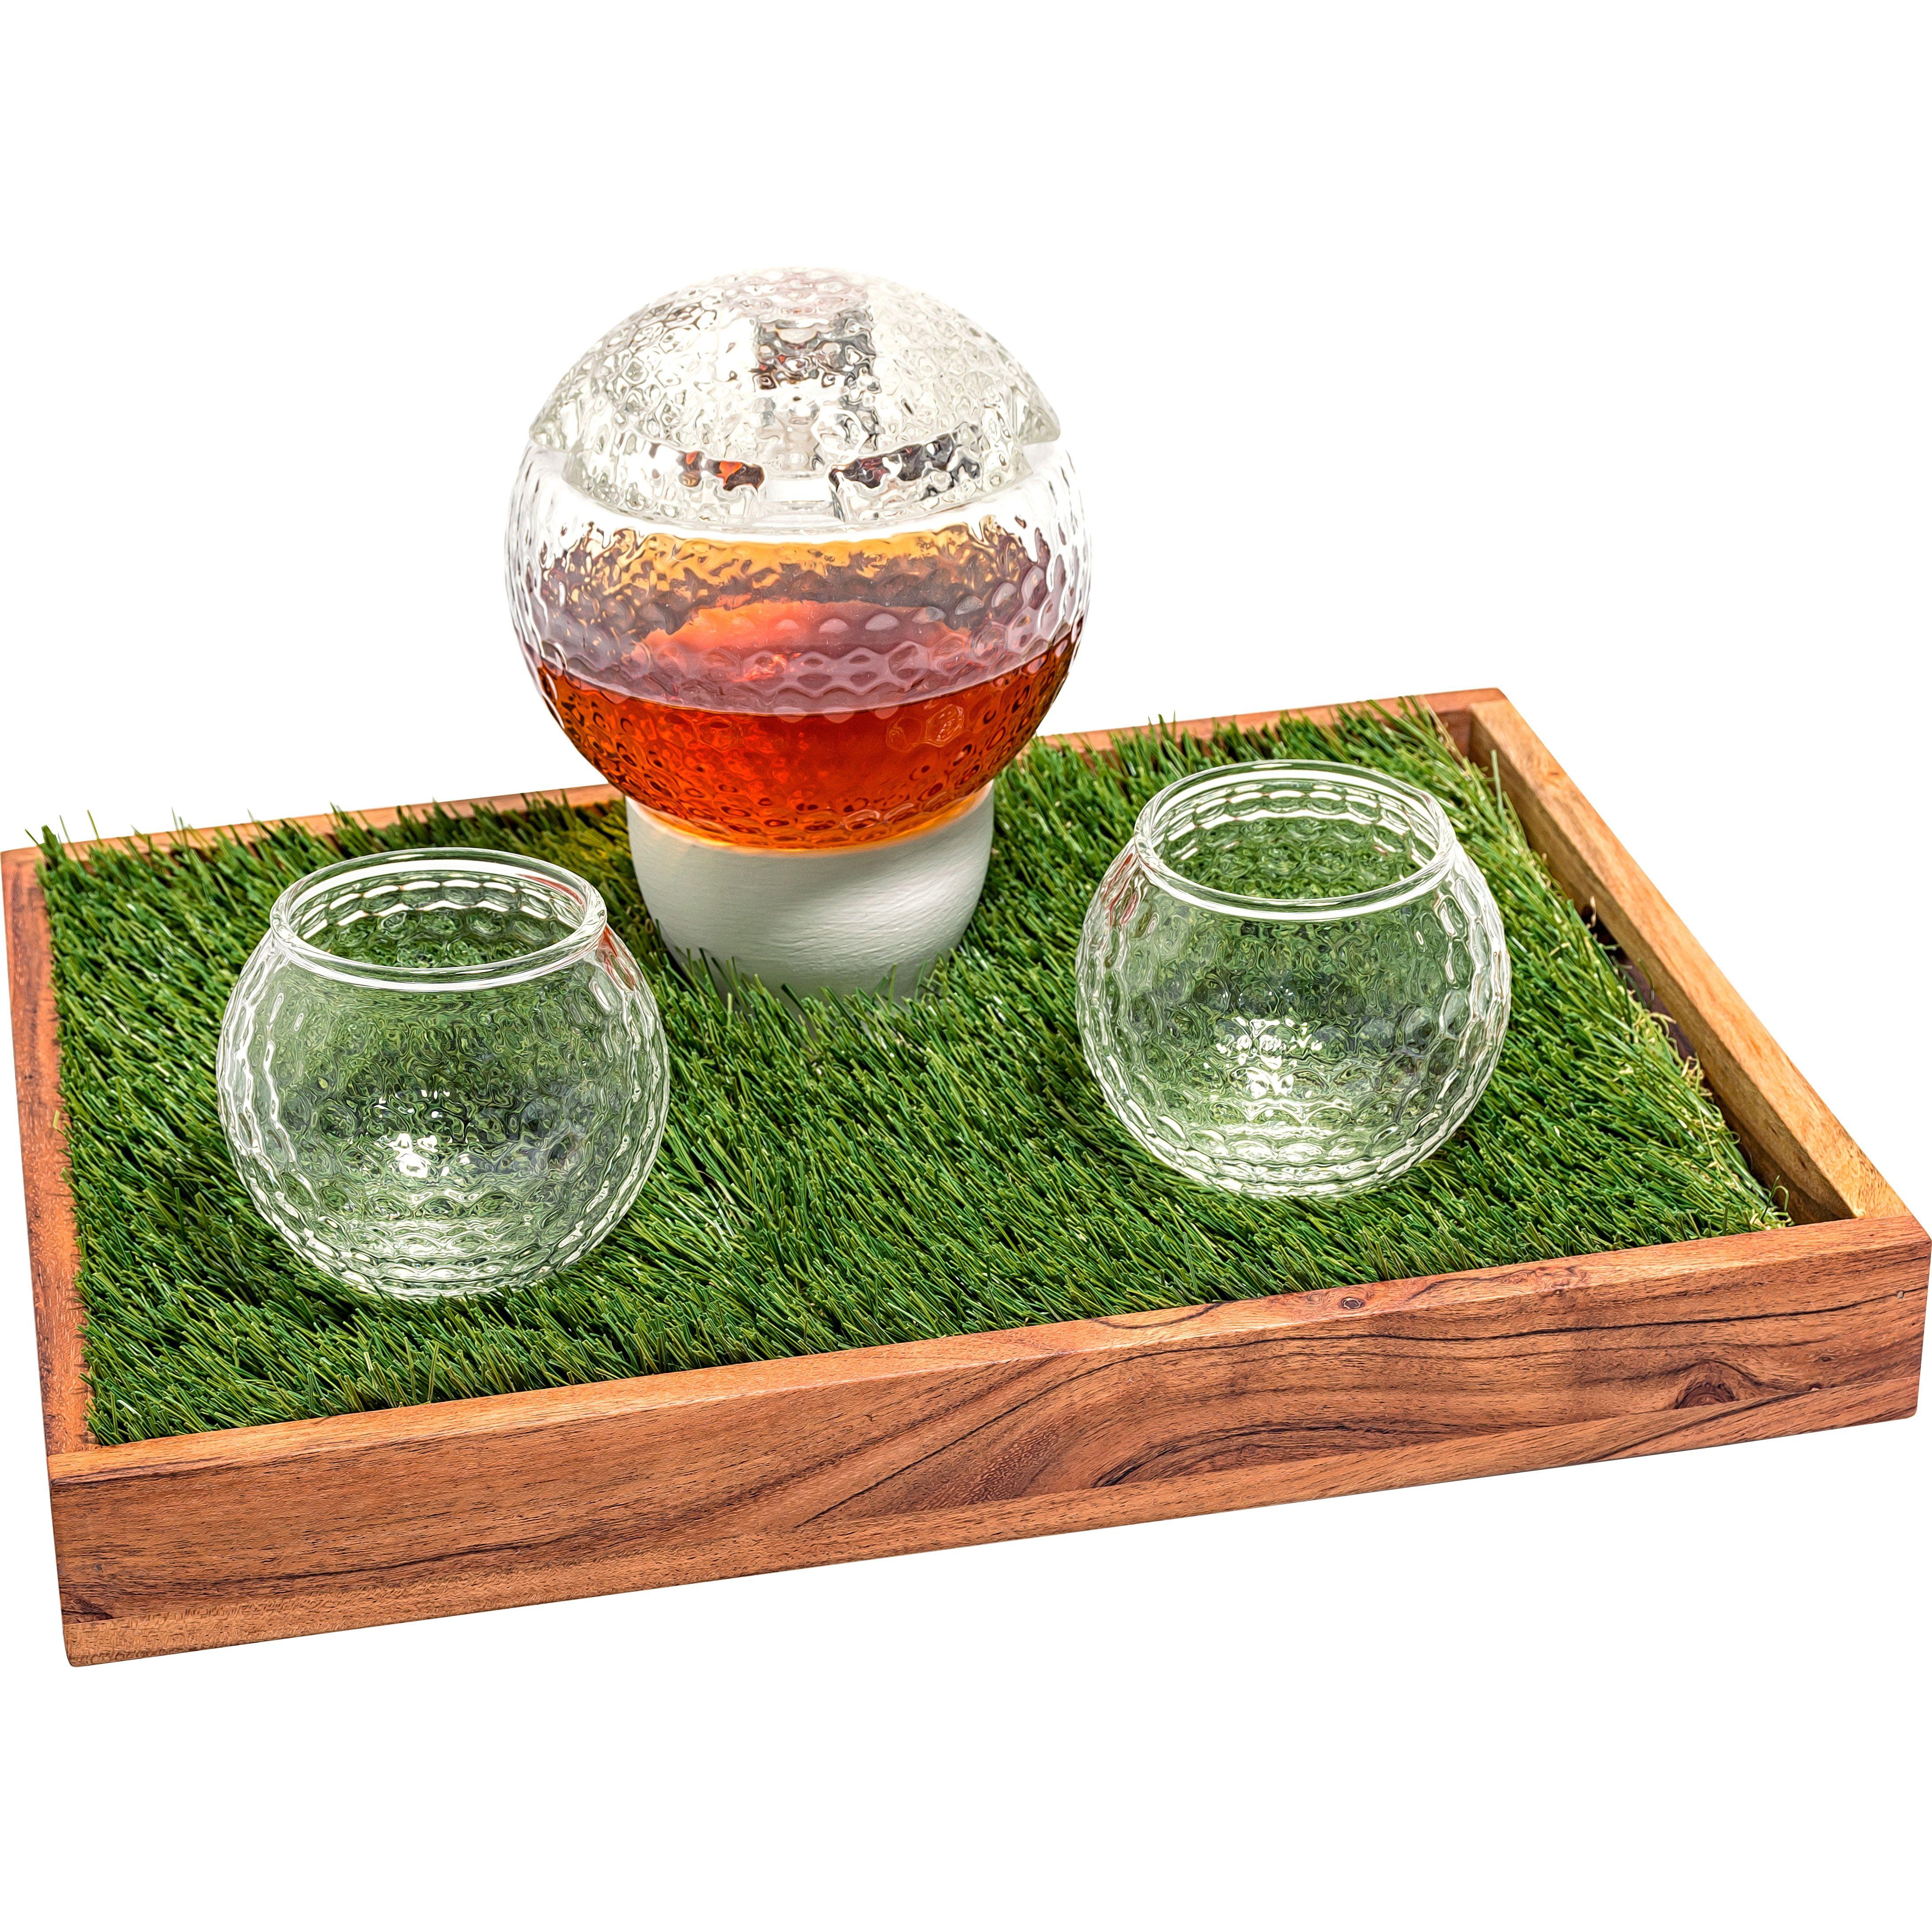 Golf Lovers Gift - Golf Decanter Set